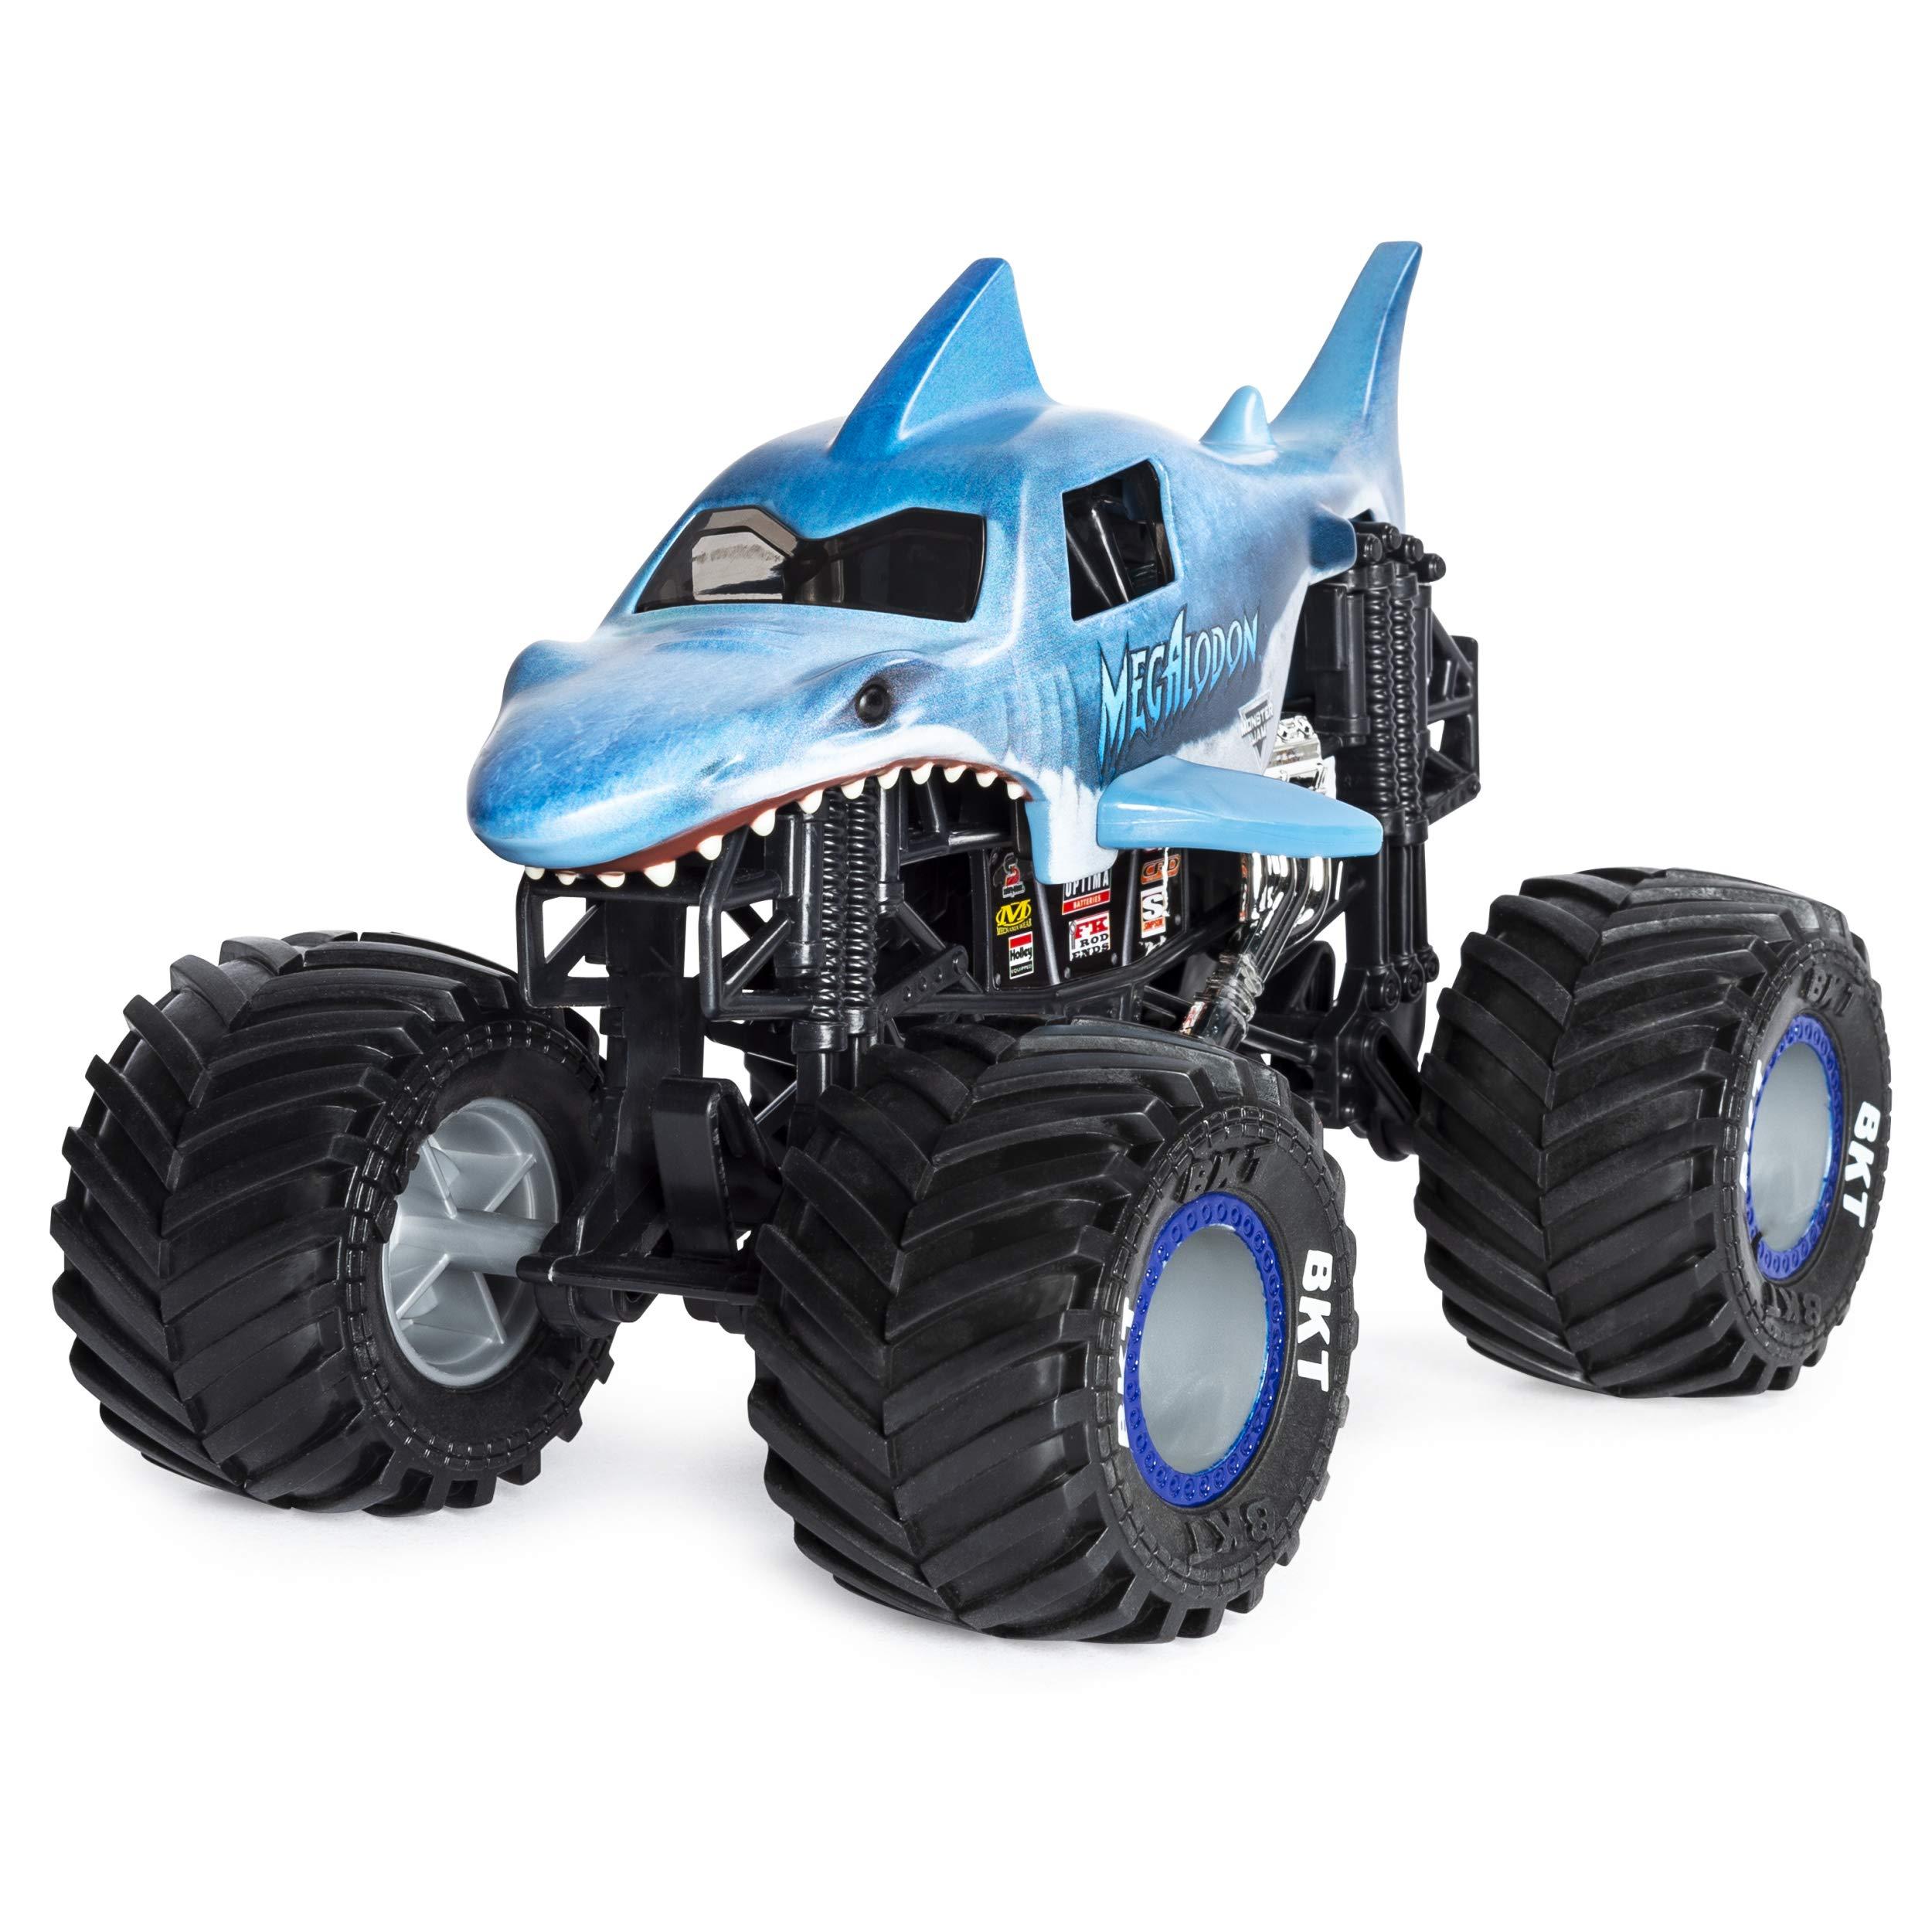 Monster Jam Official Megladon Monster Truck, Die-Cast Vehicle 1:24 Scale by Monster Jam (Image #3)